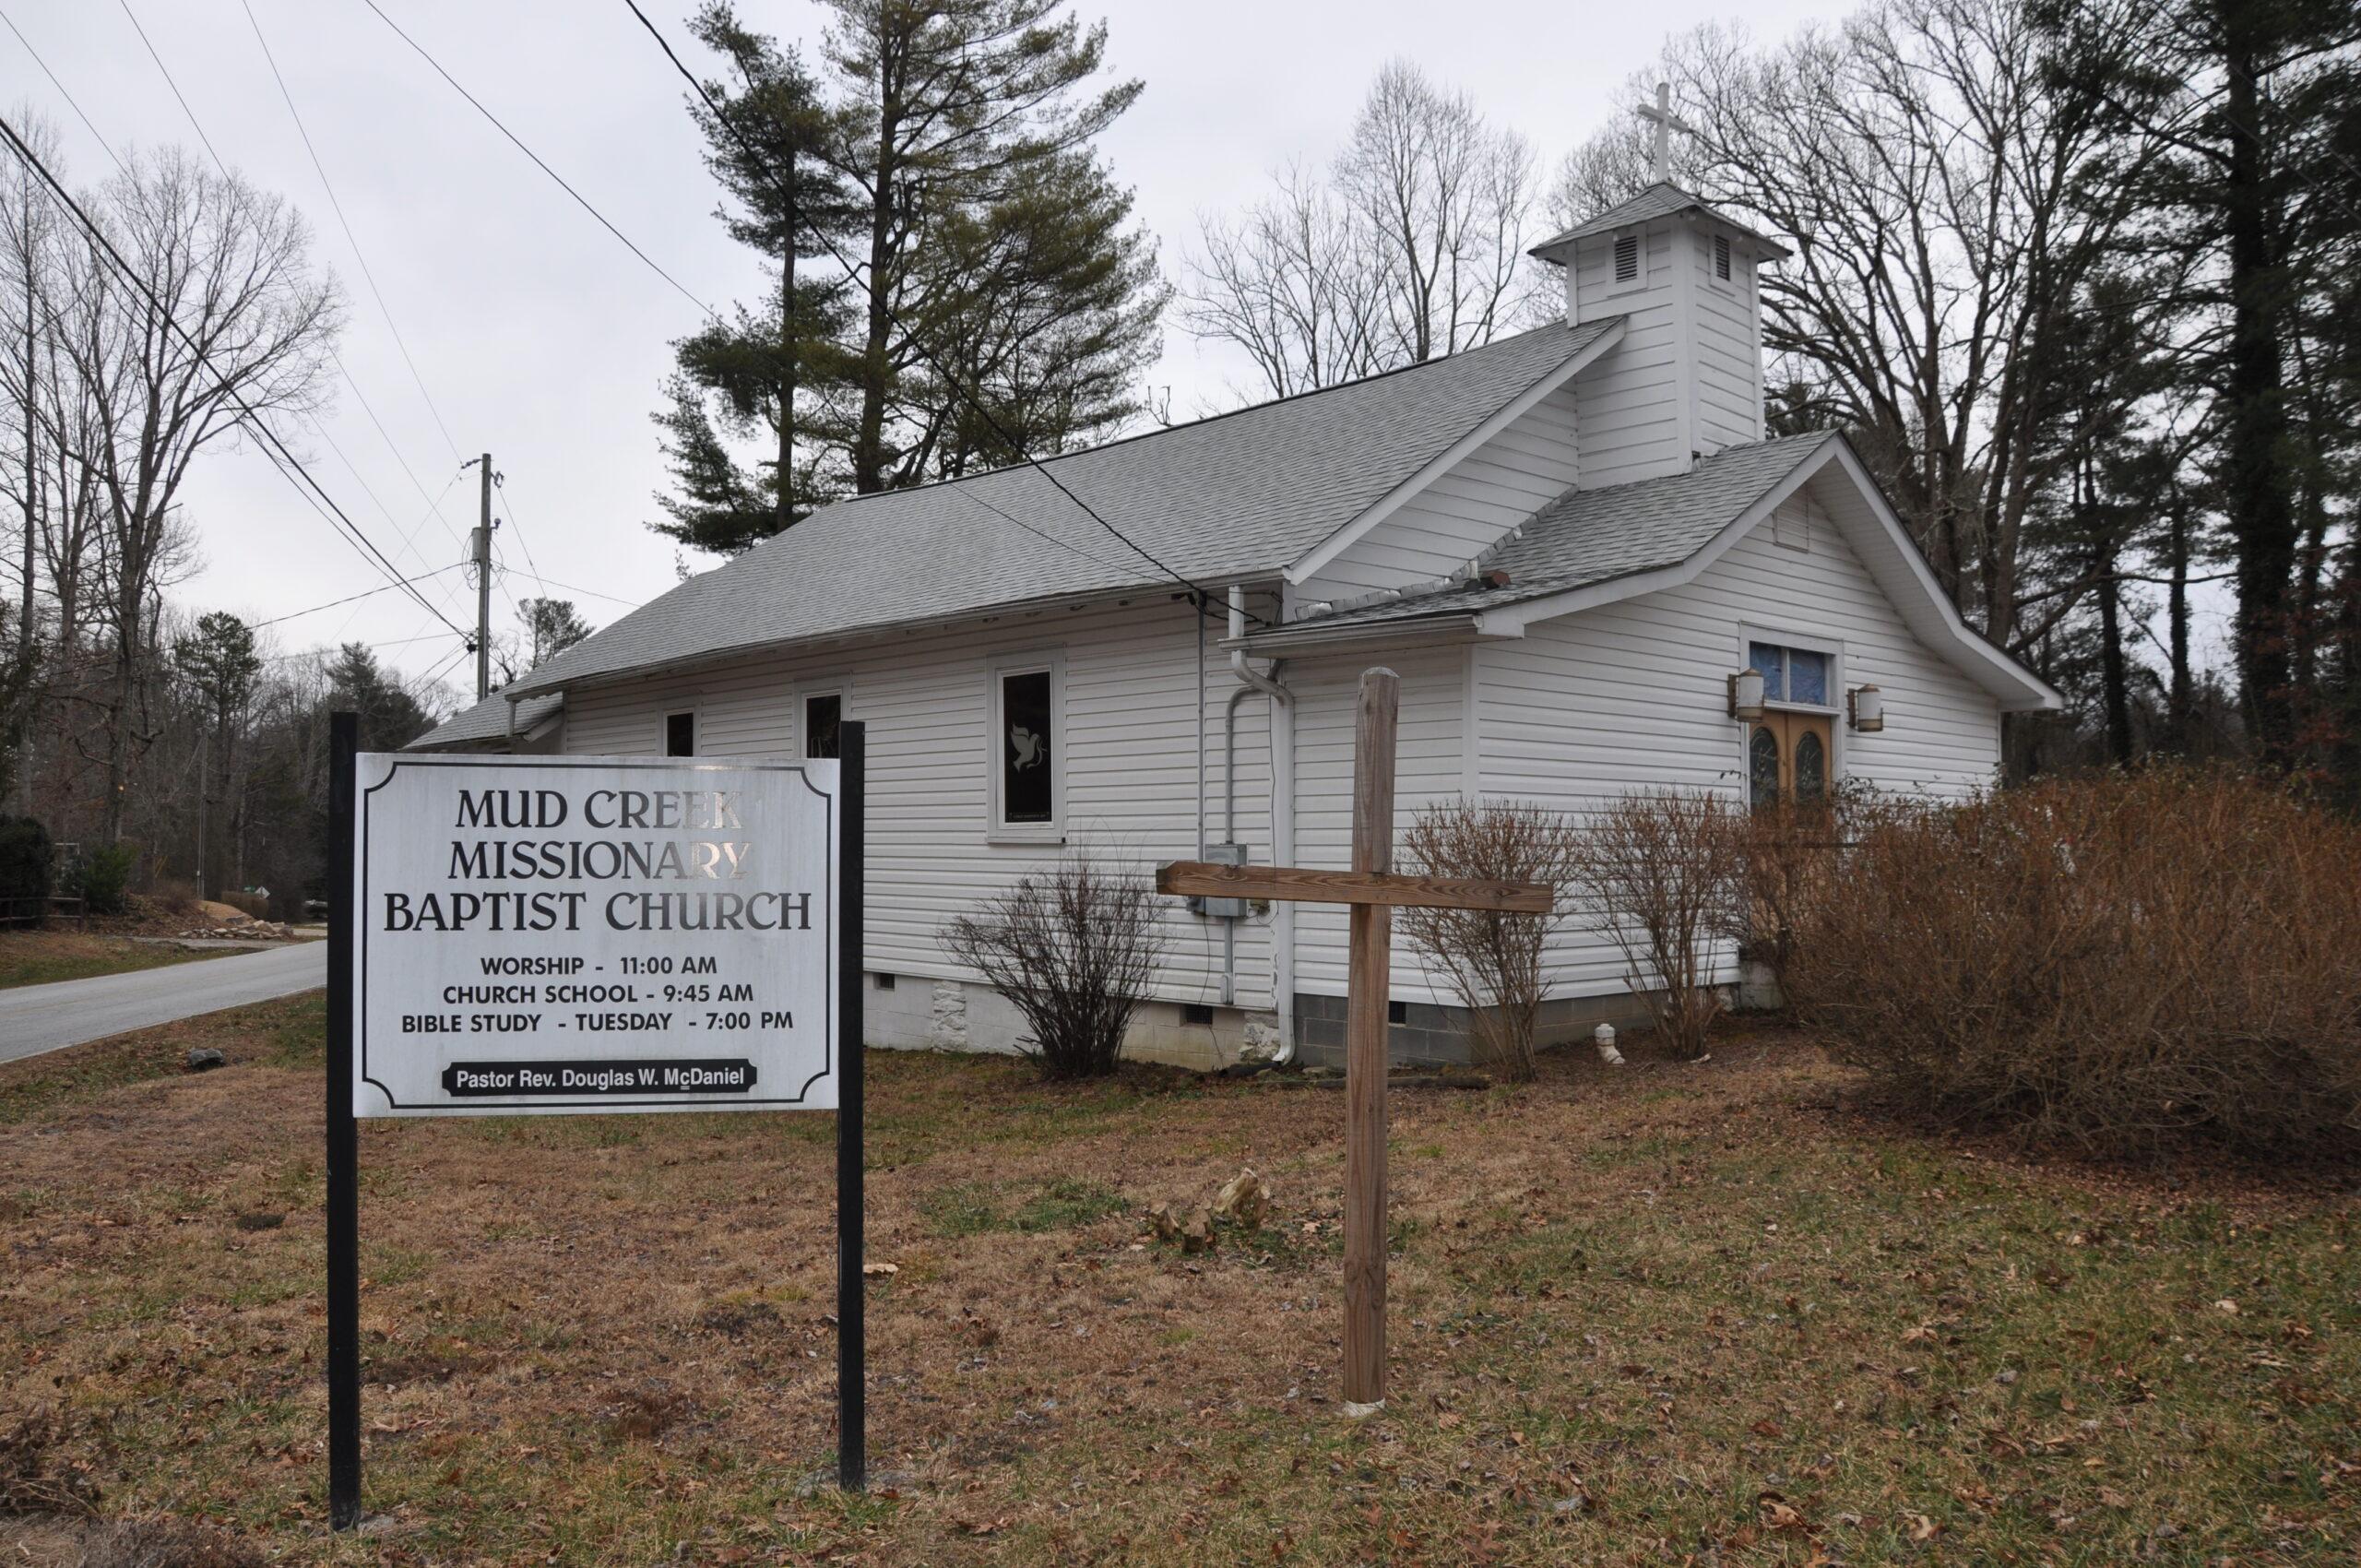 Mud Creek Missionary Baptist Church (East Flat Rock)